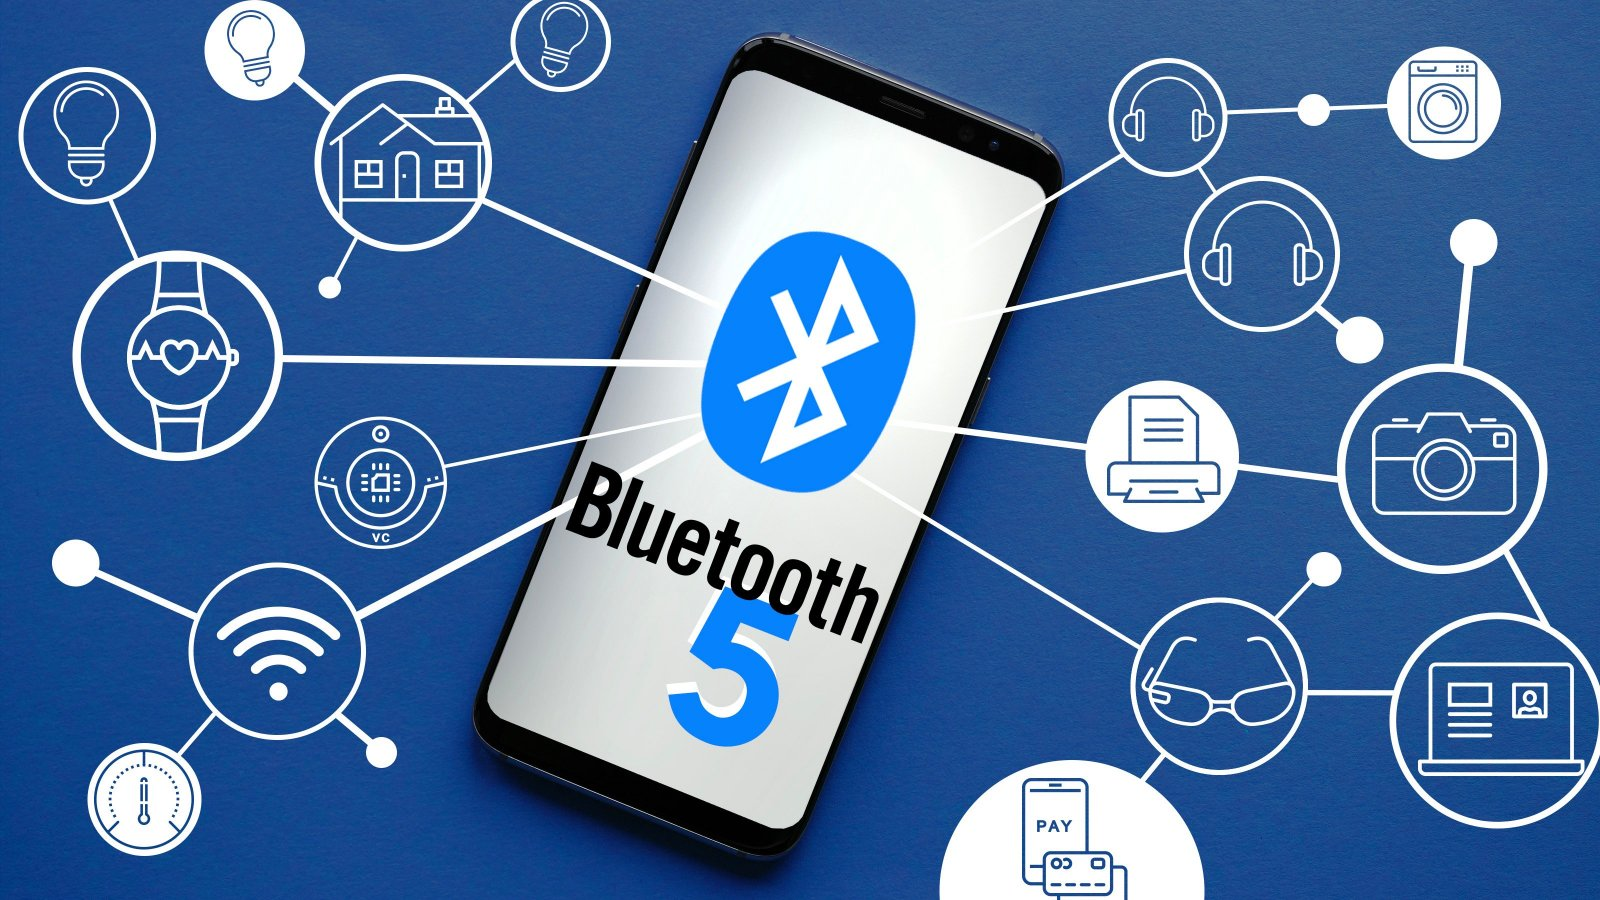 Bluetooth 5-Vernetzung